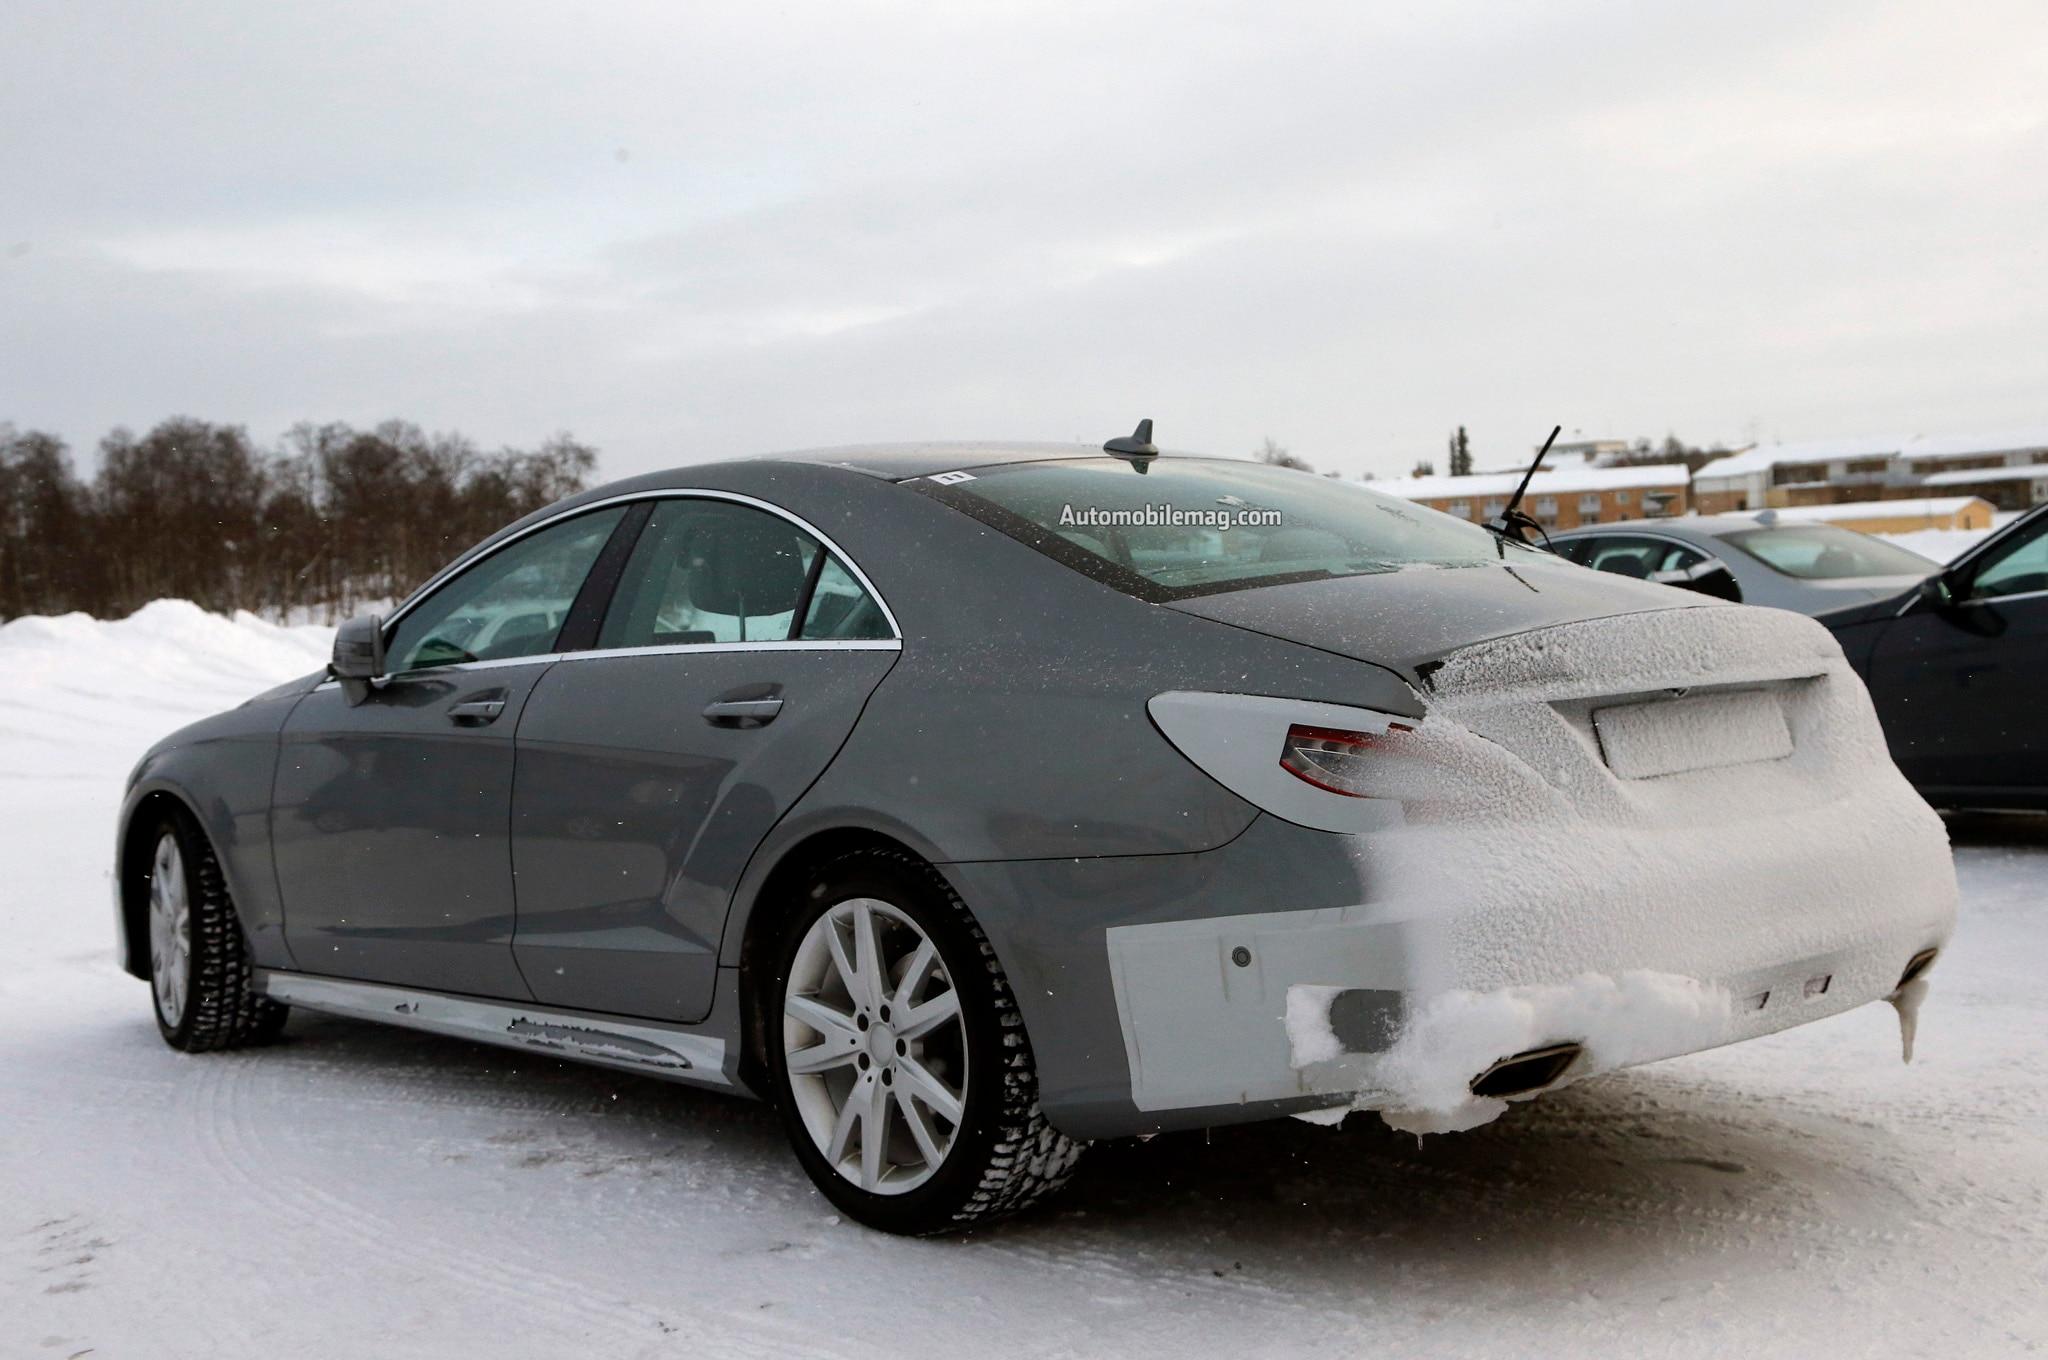 2015 mercedes benz cls class facelift spied automobile for 2015 mercedes benz cl